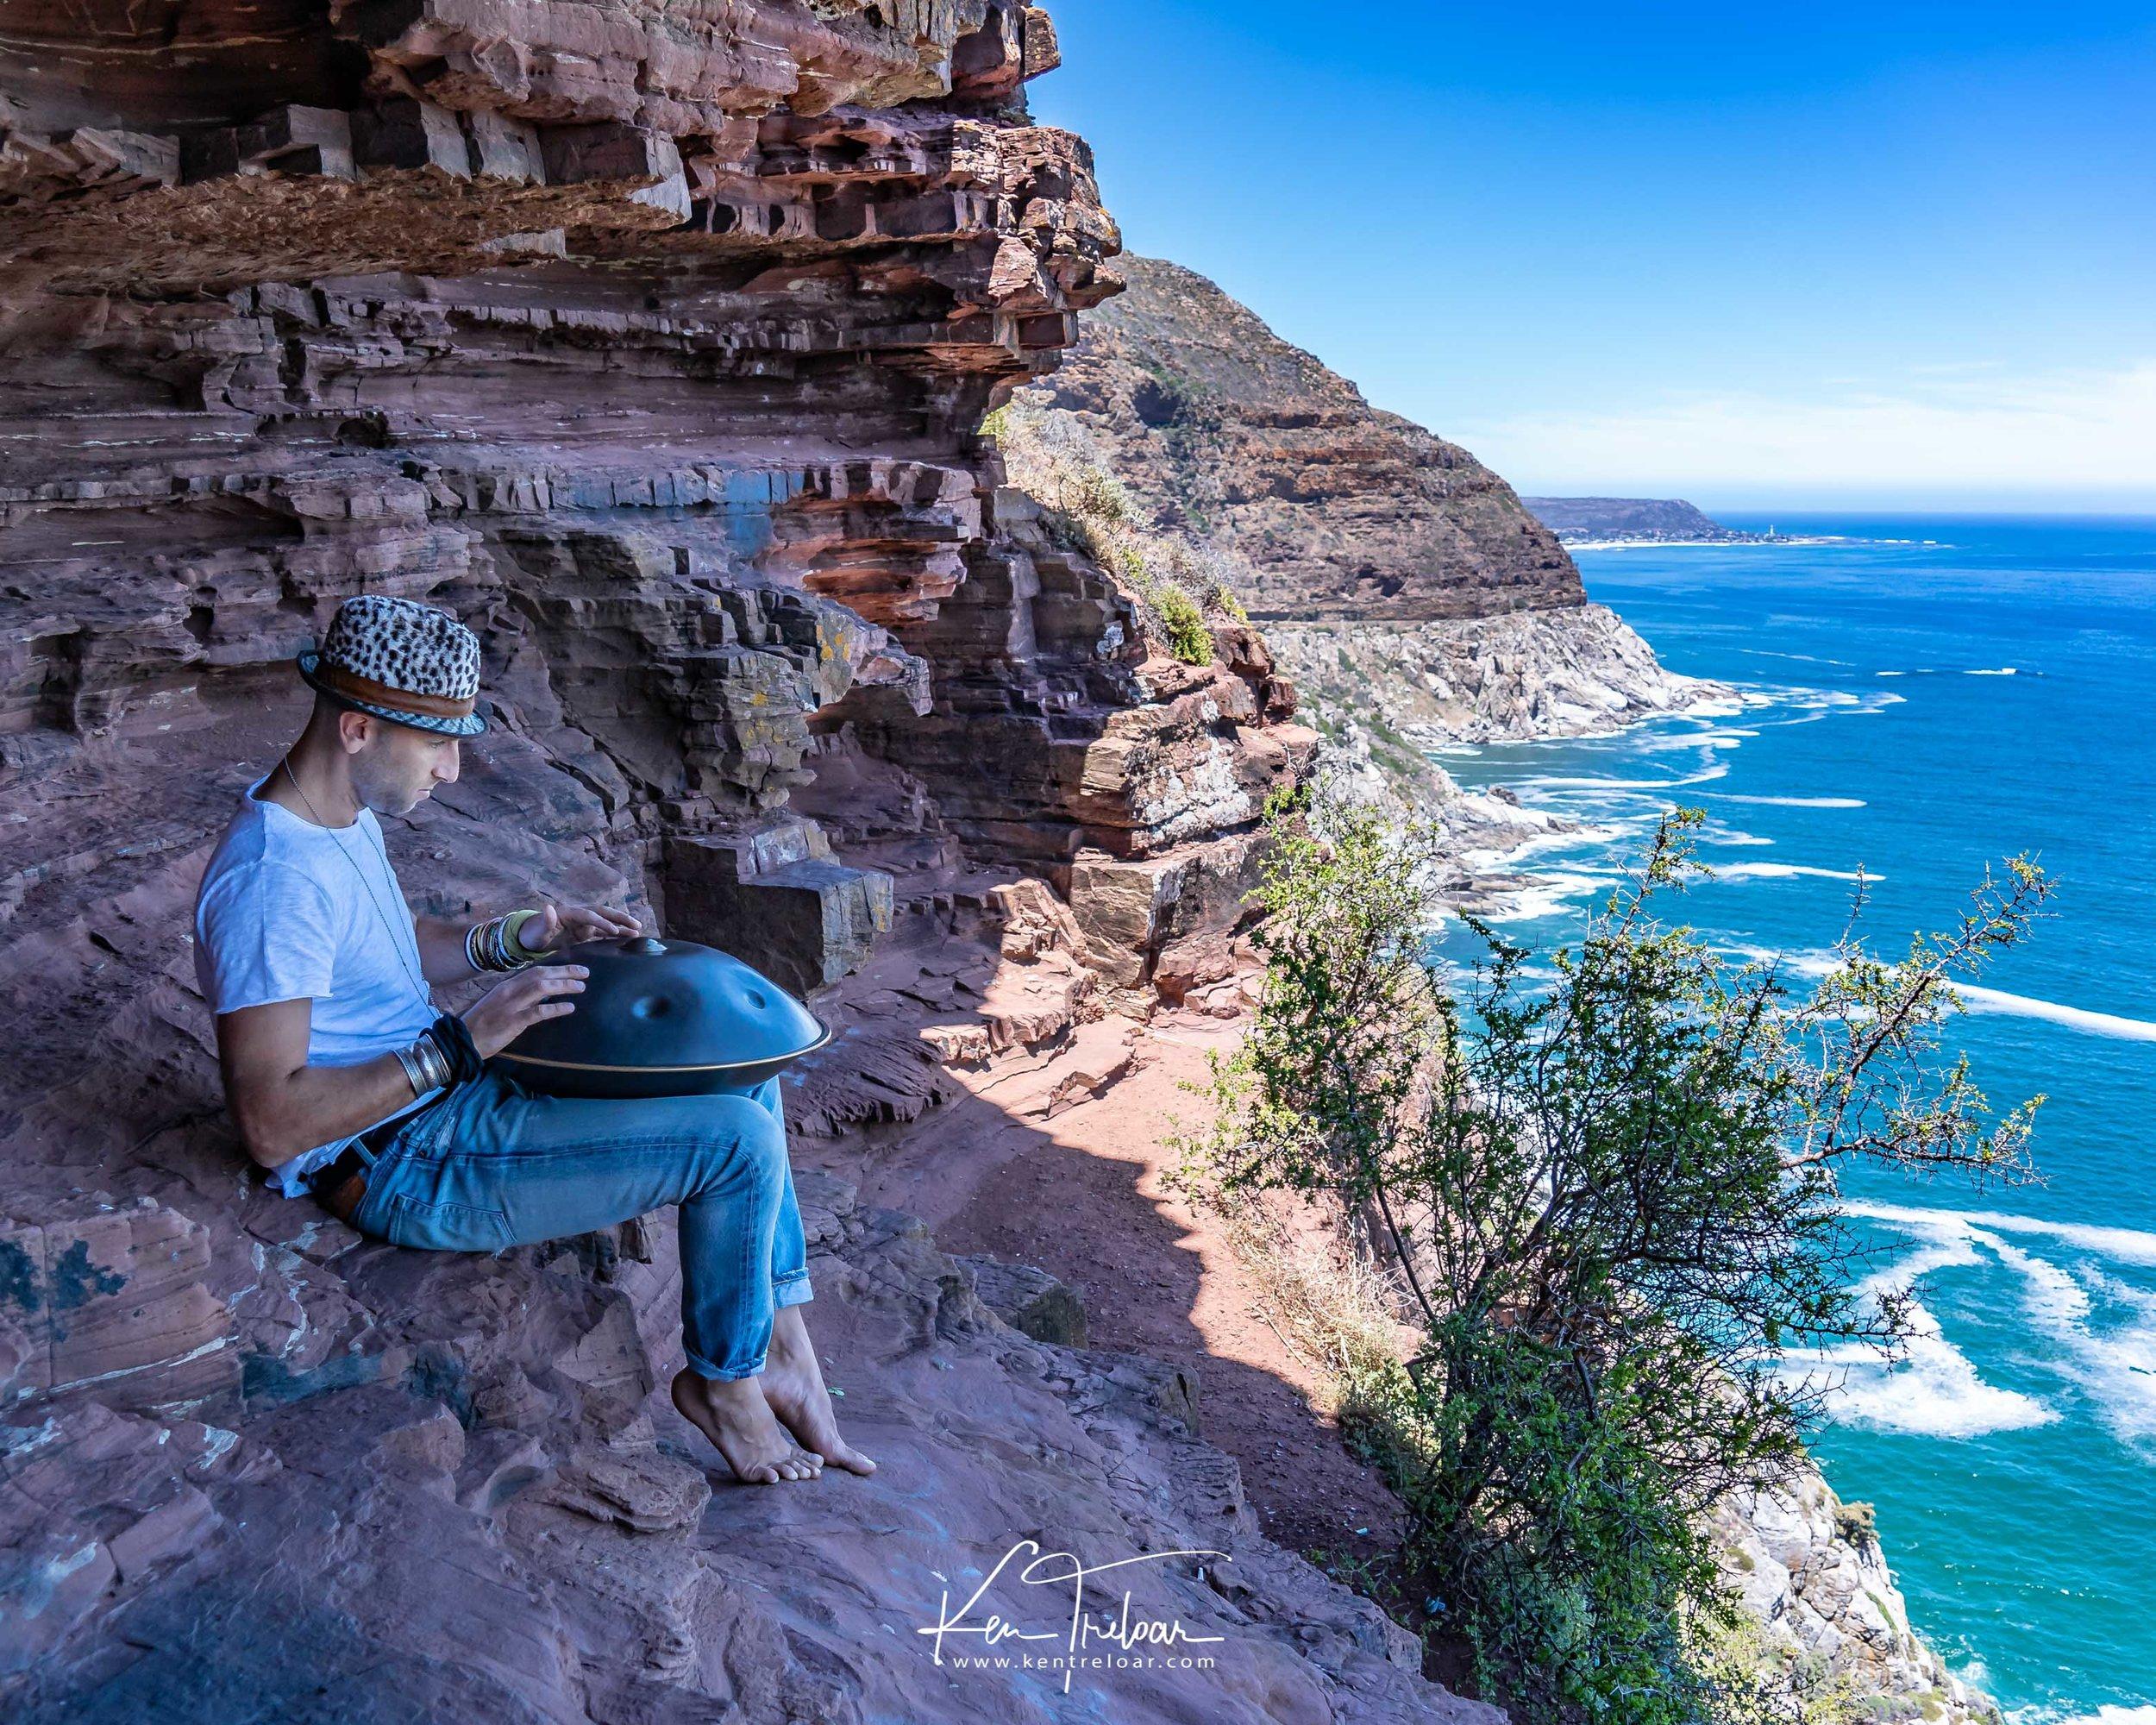 Marci Selvaggio - Hang Instrument Cape Town Tour - South Afica - Chapmans Peak Drive - Image by Ken Treloar-4.jpg